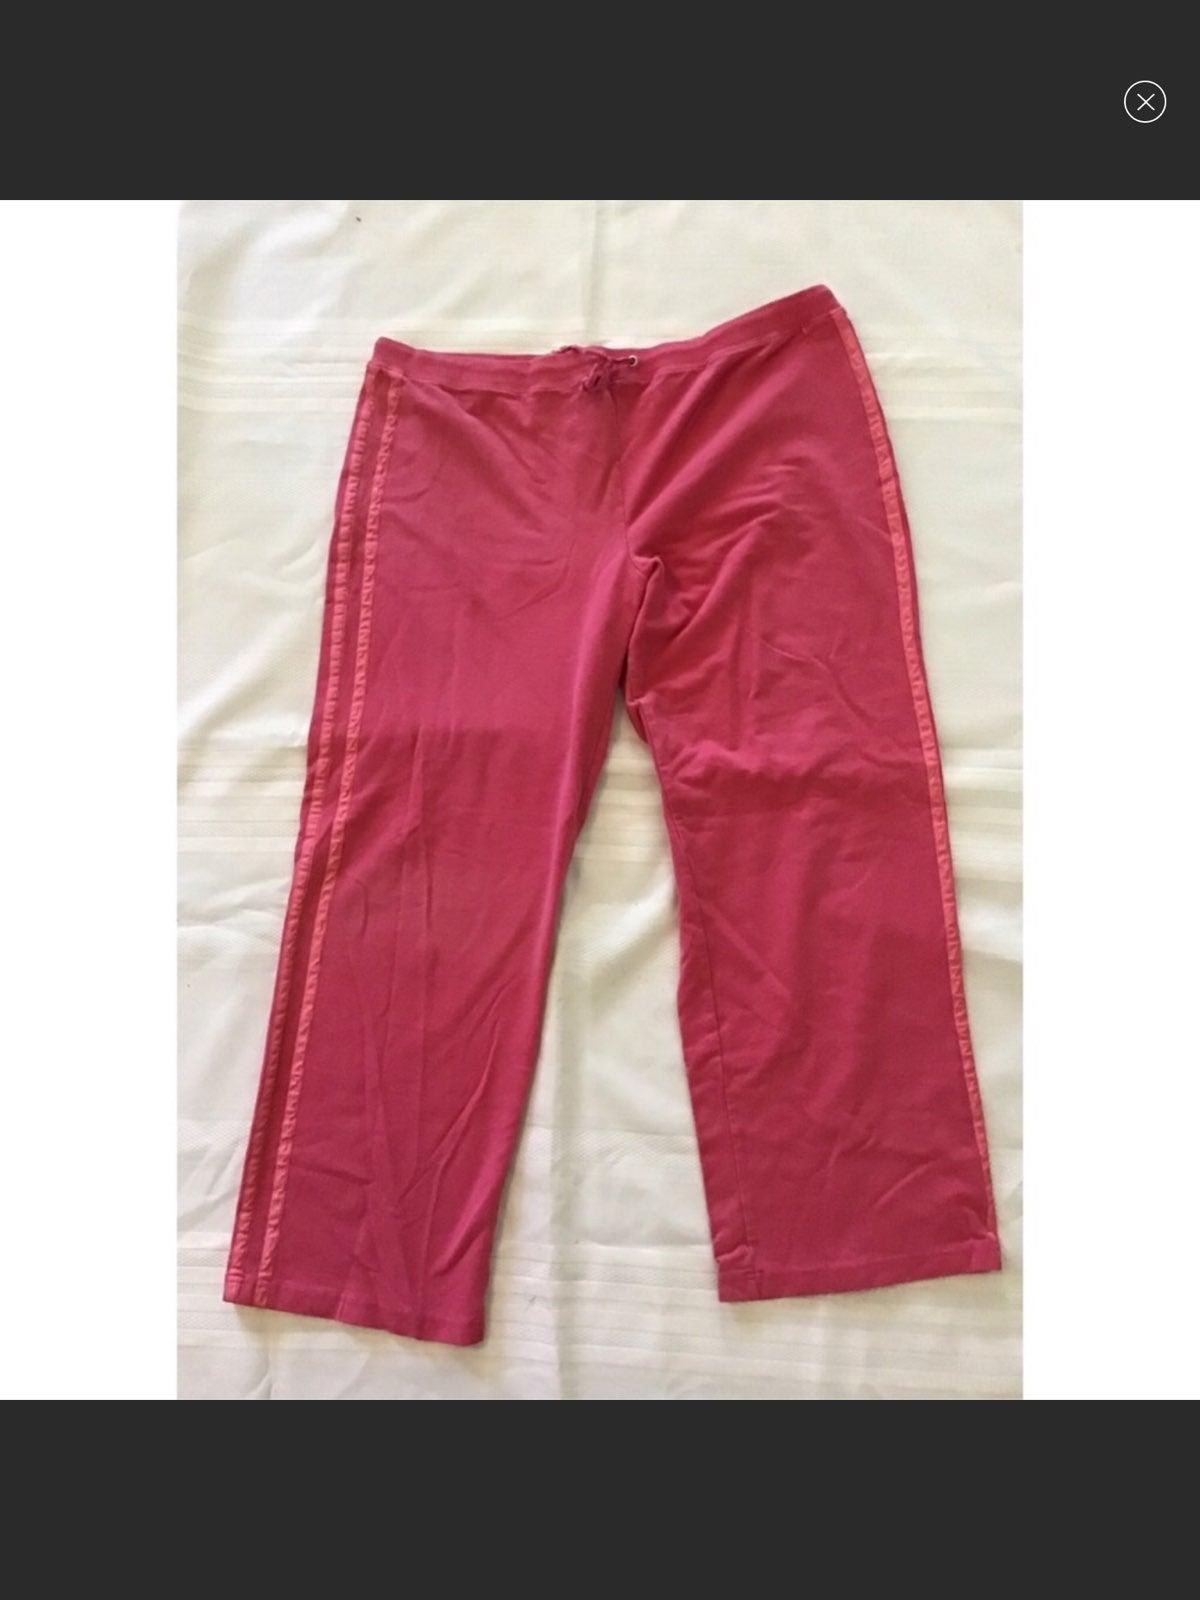 Danskin Now Yoga Pants-XLarge(16/18)